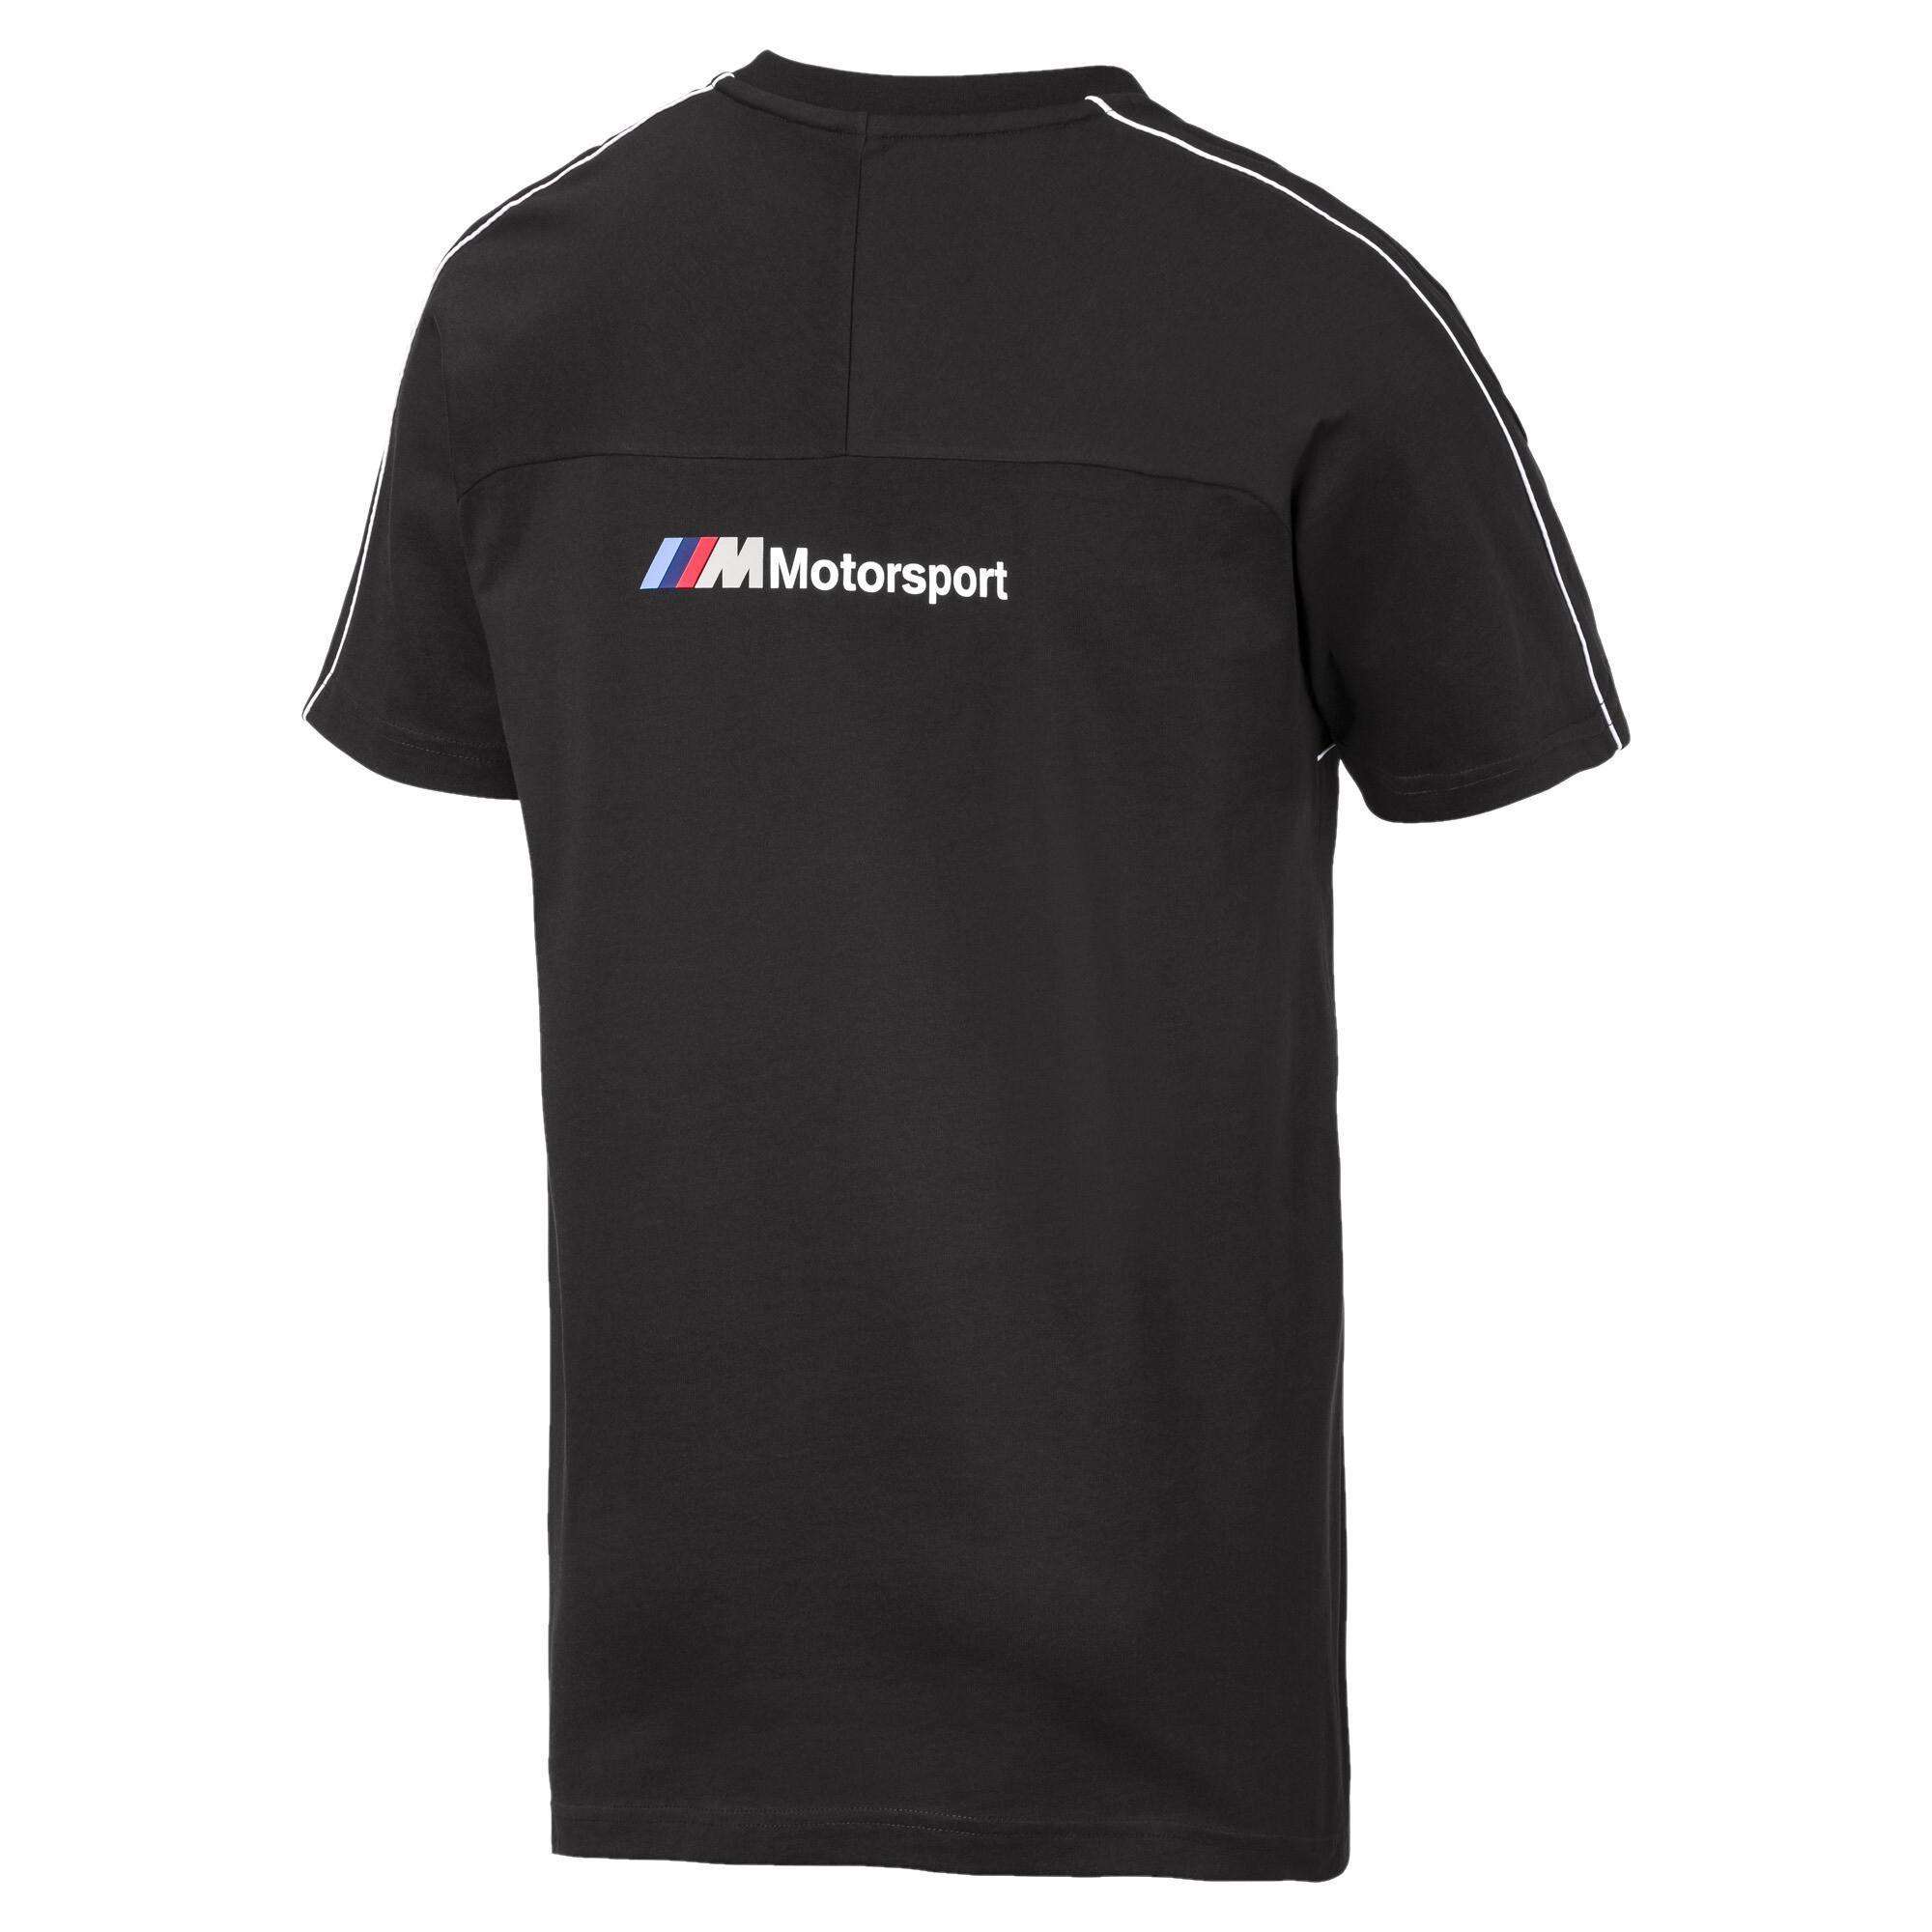 Indexbild 3 - PUMA BMW M Motorsport T7 Herren T-Shirt Männer T-Shirt Neu